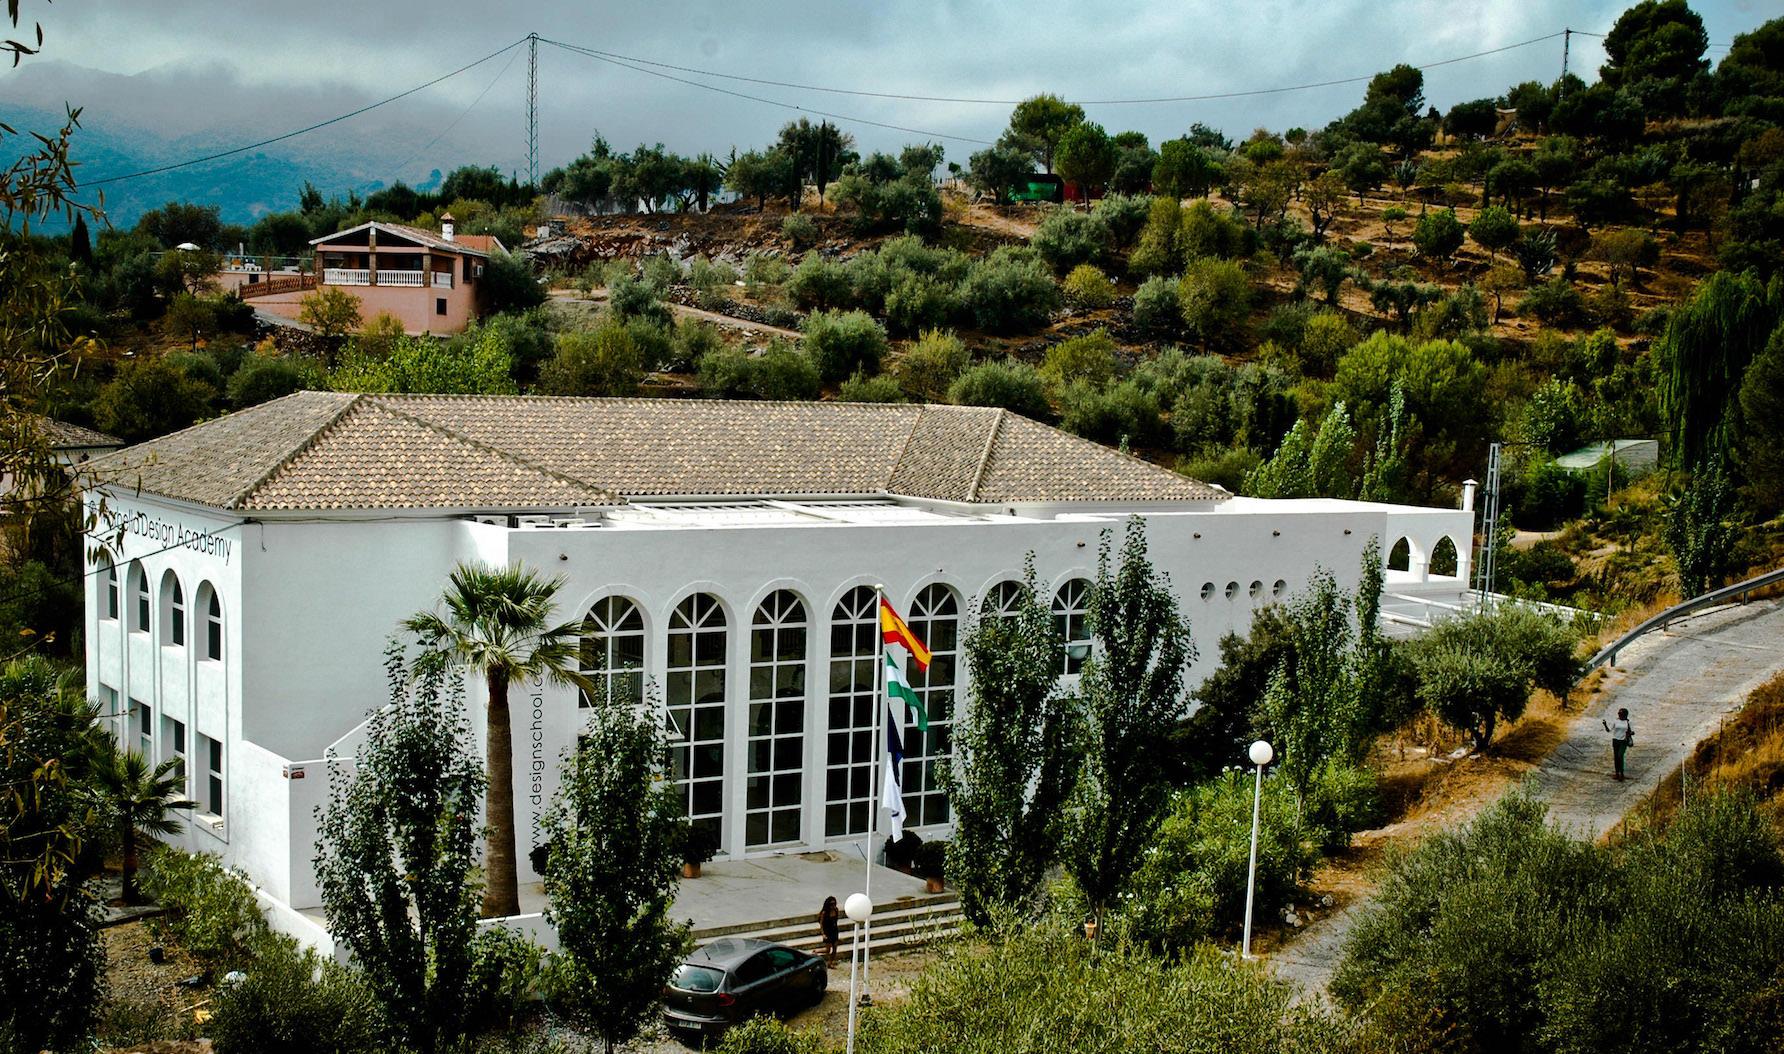 ESPANJAAN OPISKELEMAAN! Marbella Design Academy. Espanjaan yliopistoon.